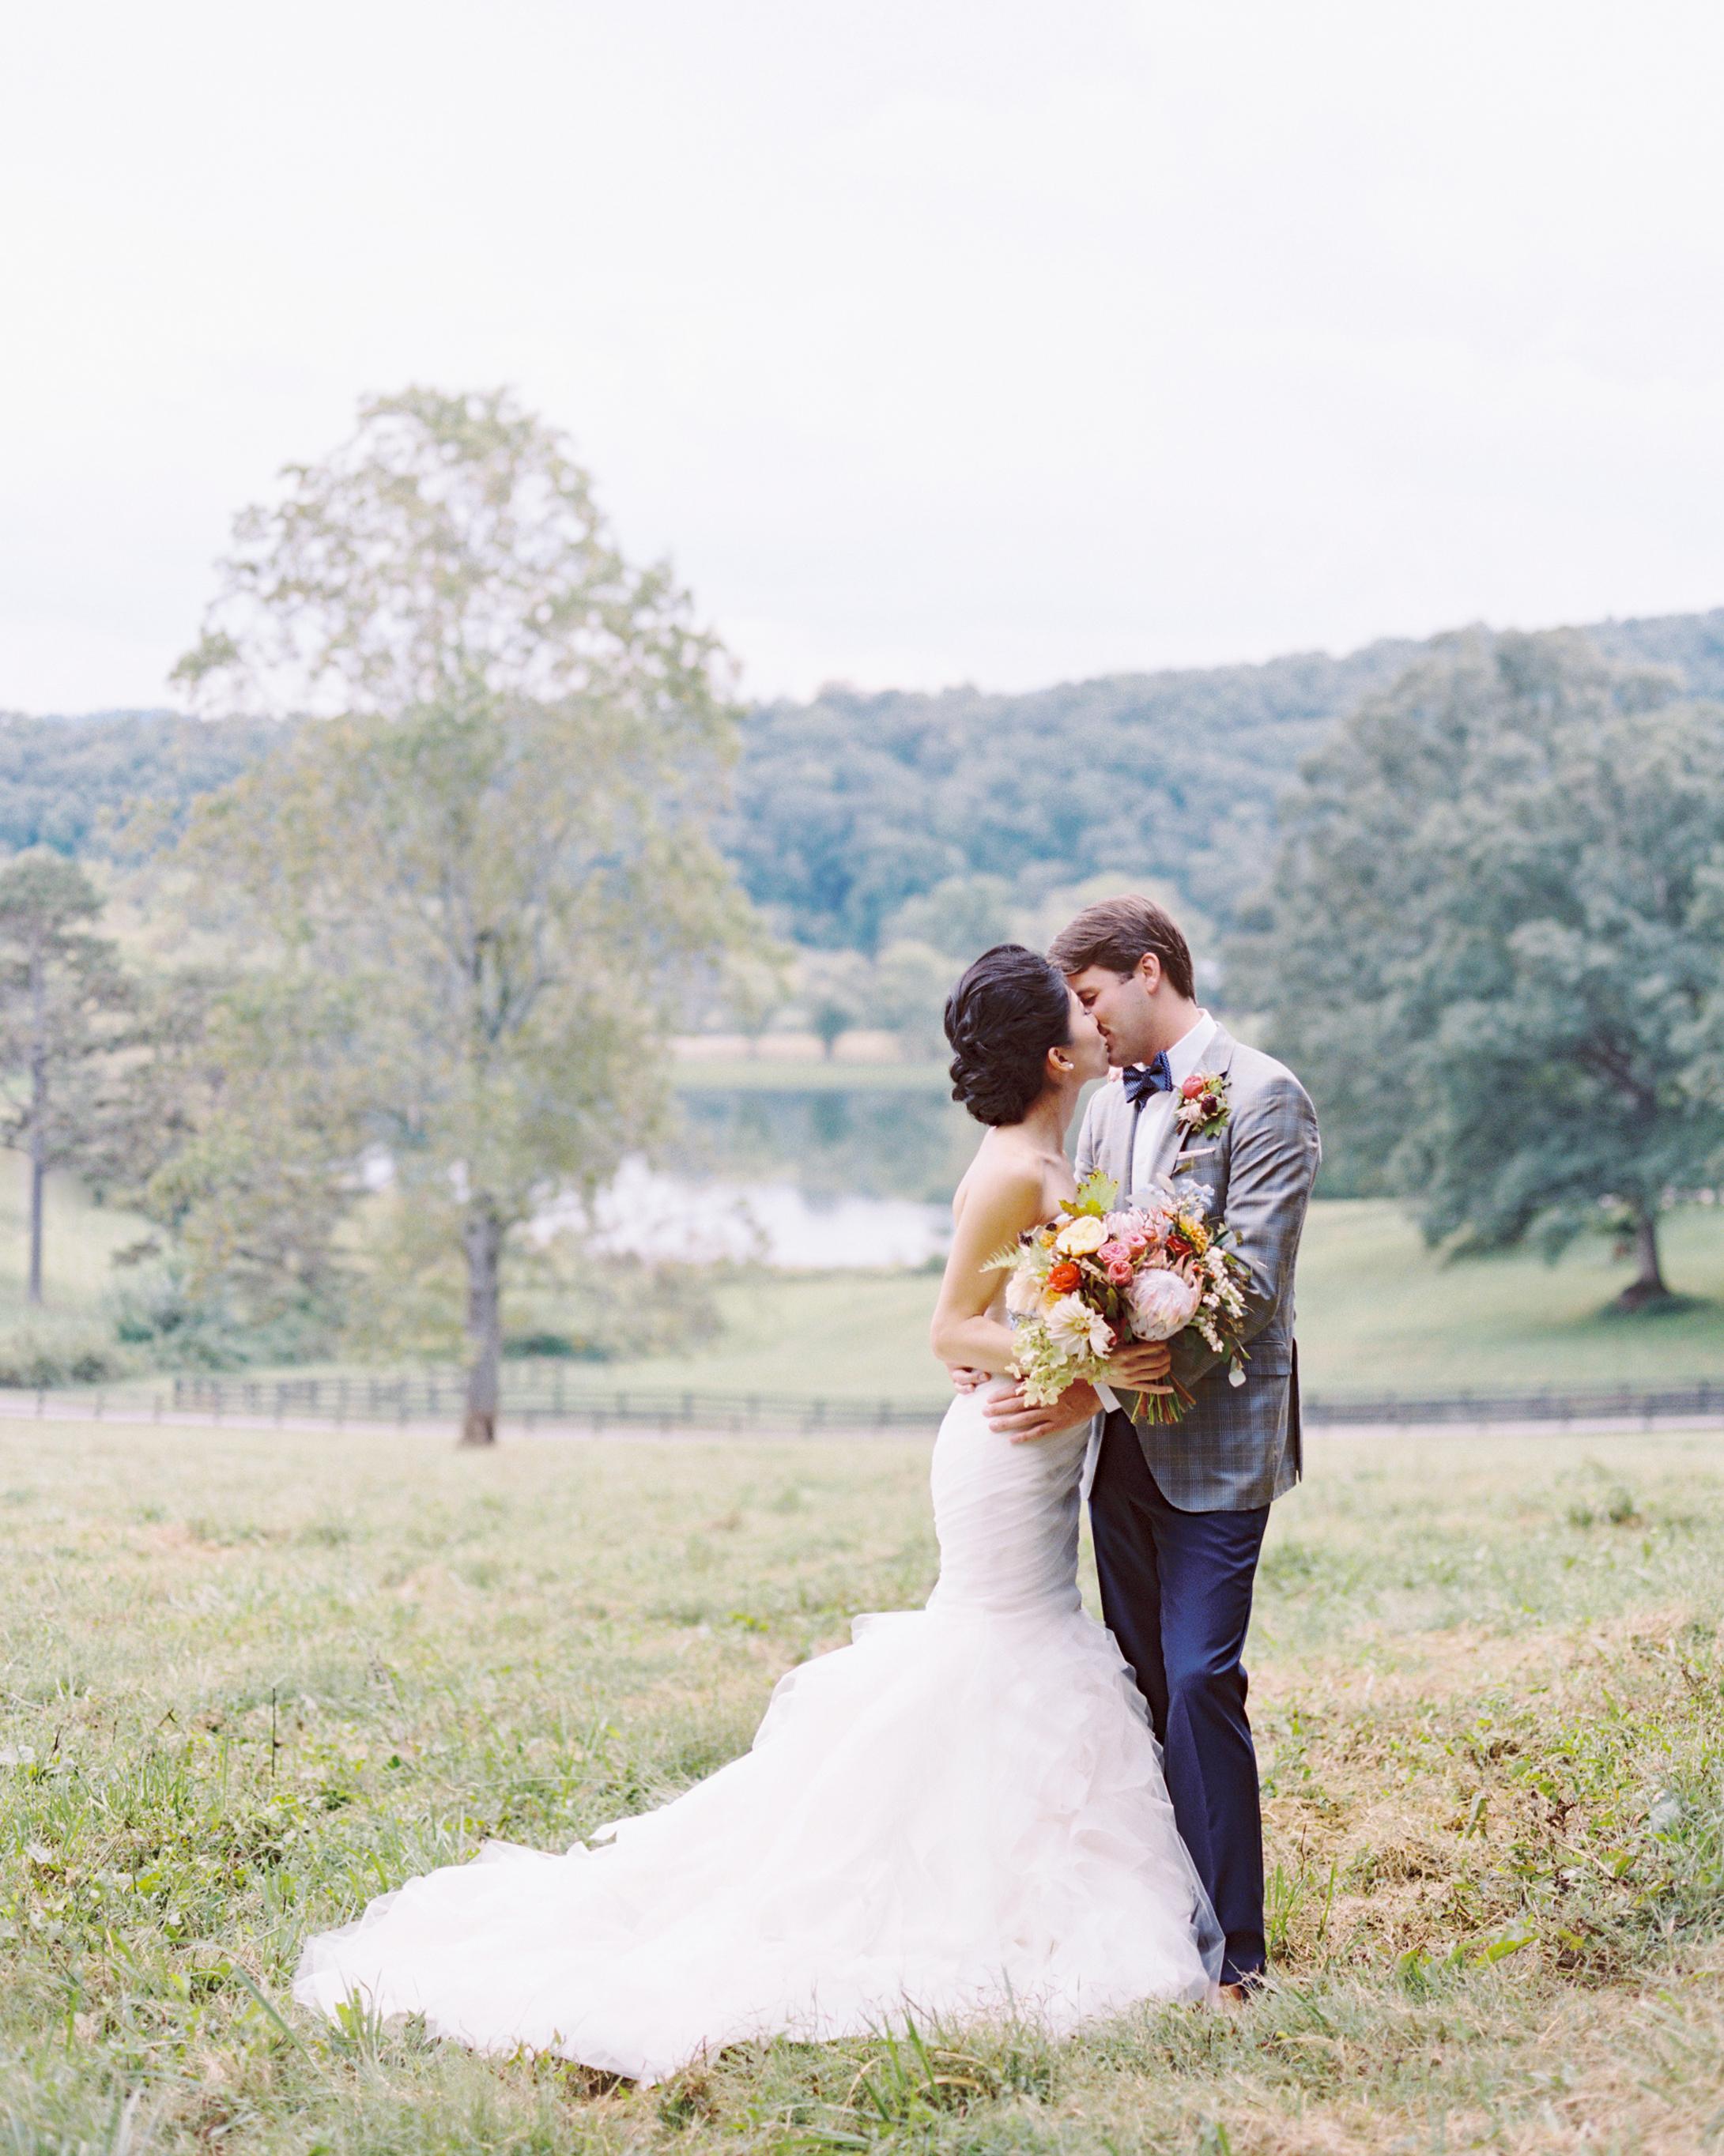 michelle-john-wedding-north-carolina-3-s111840-0215.jpg